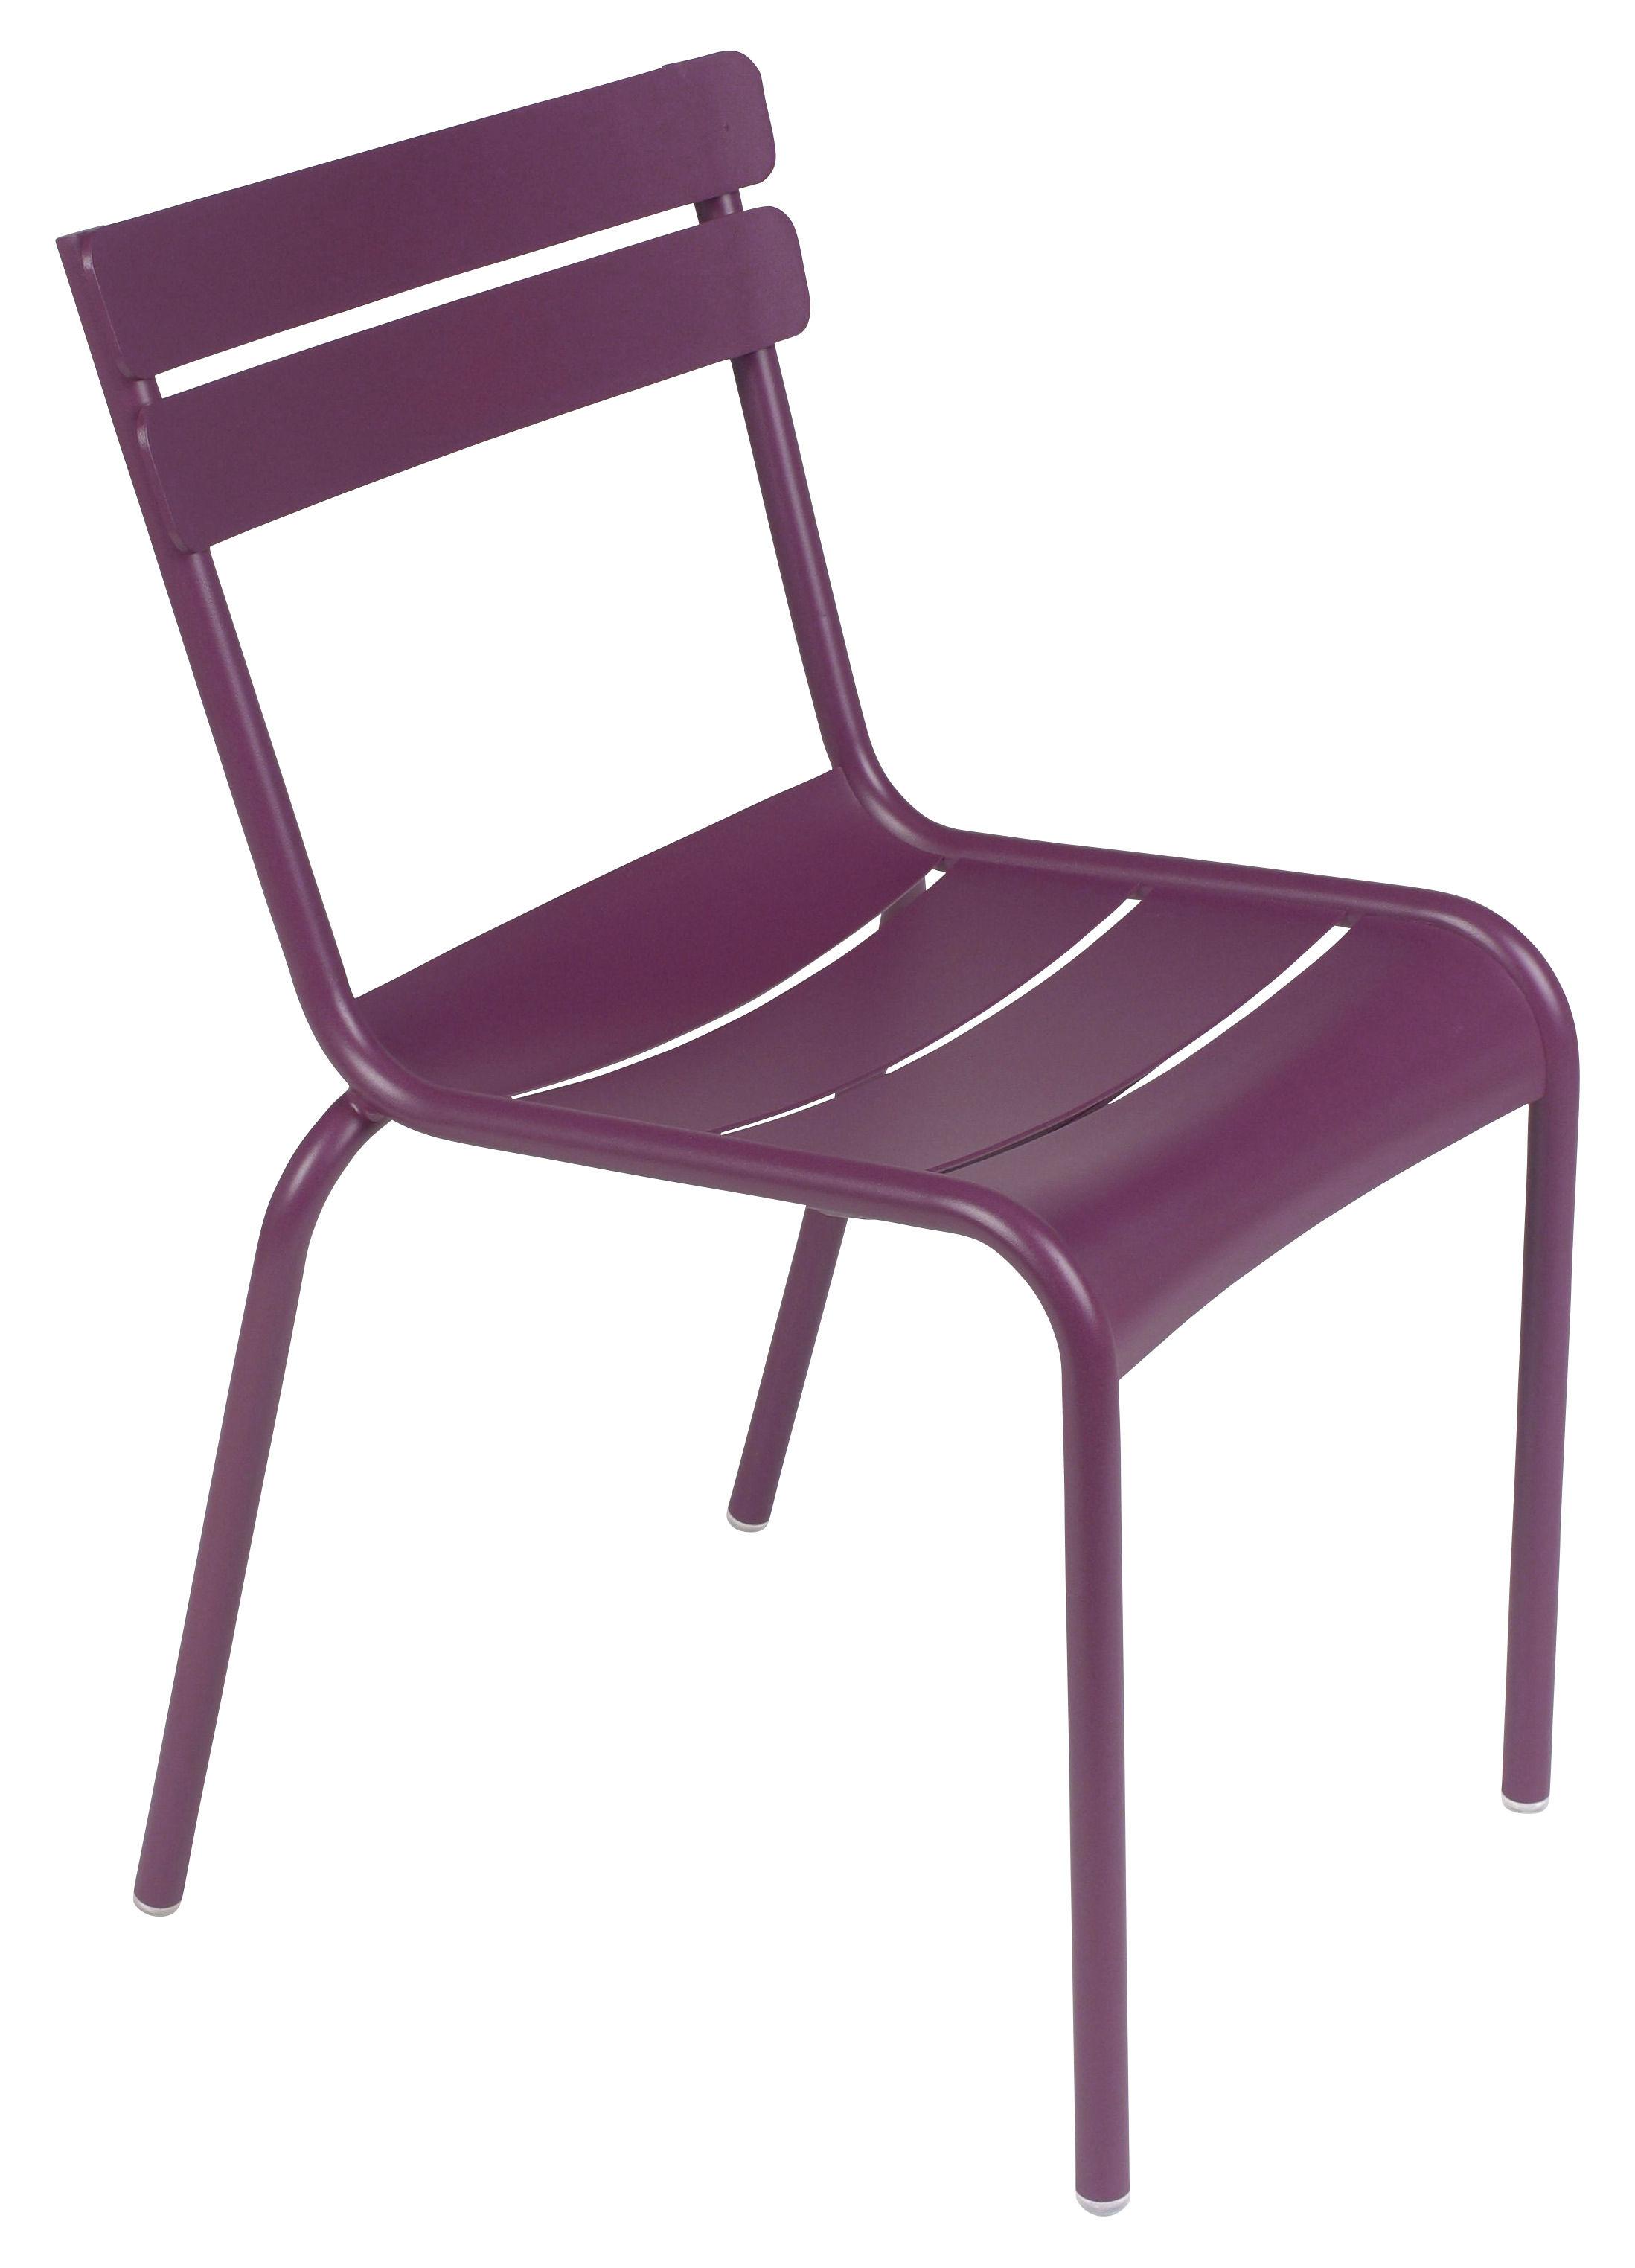 chaise empilable luxembourg aluminium aubergine fermob. Black Bedroom Furniture Sets. Home Design Ideas